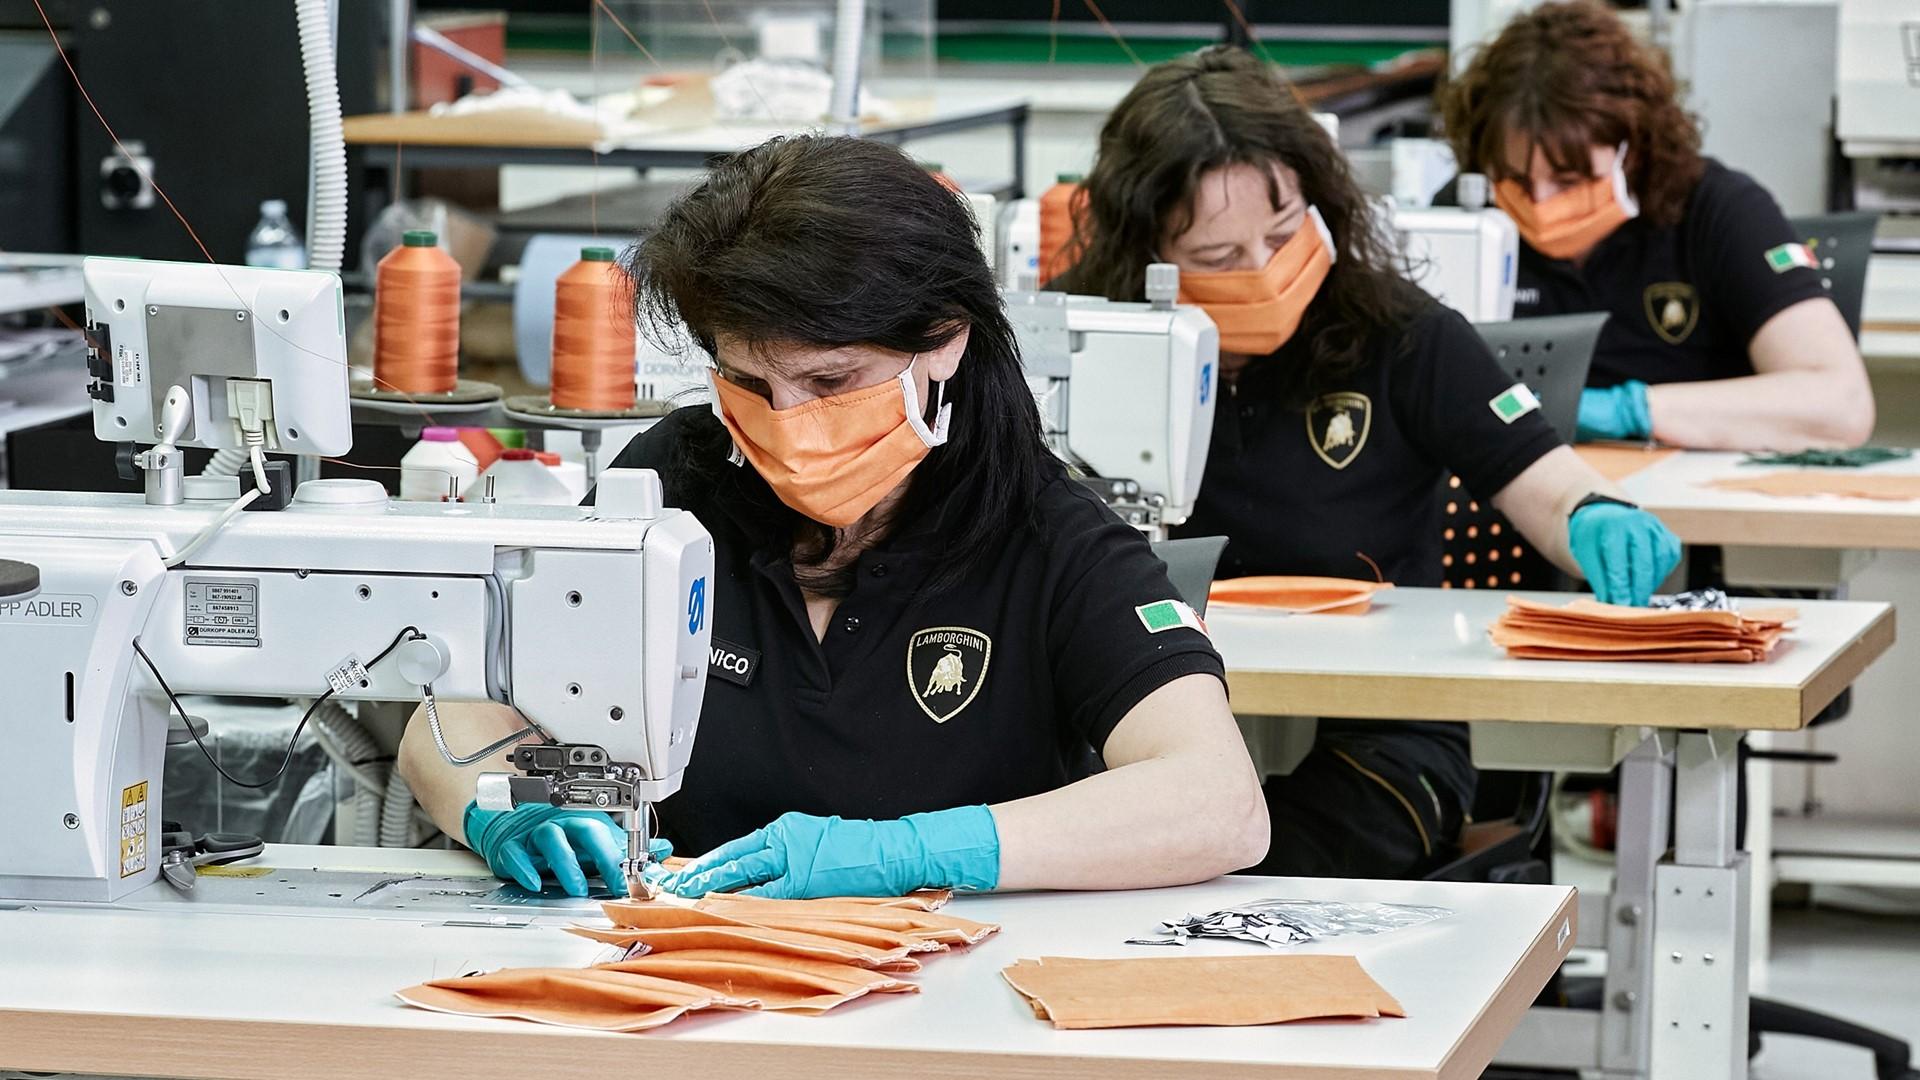 Automobili Lamborghini starts production of surgical masks and medical shields for use in Coronavirus pandemic - Image 8